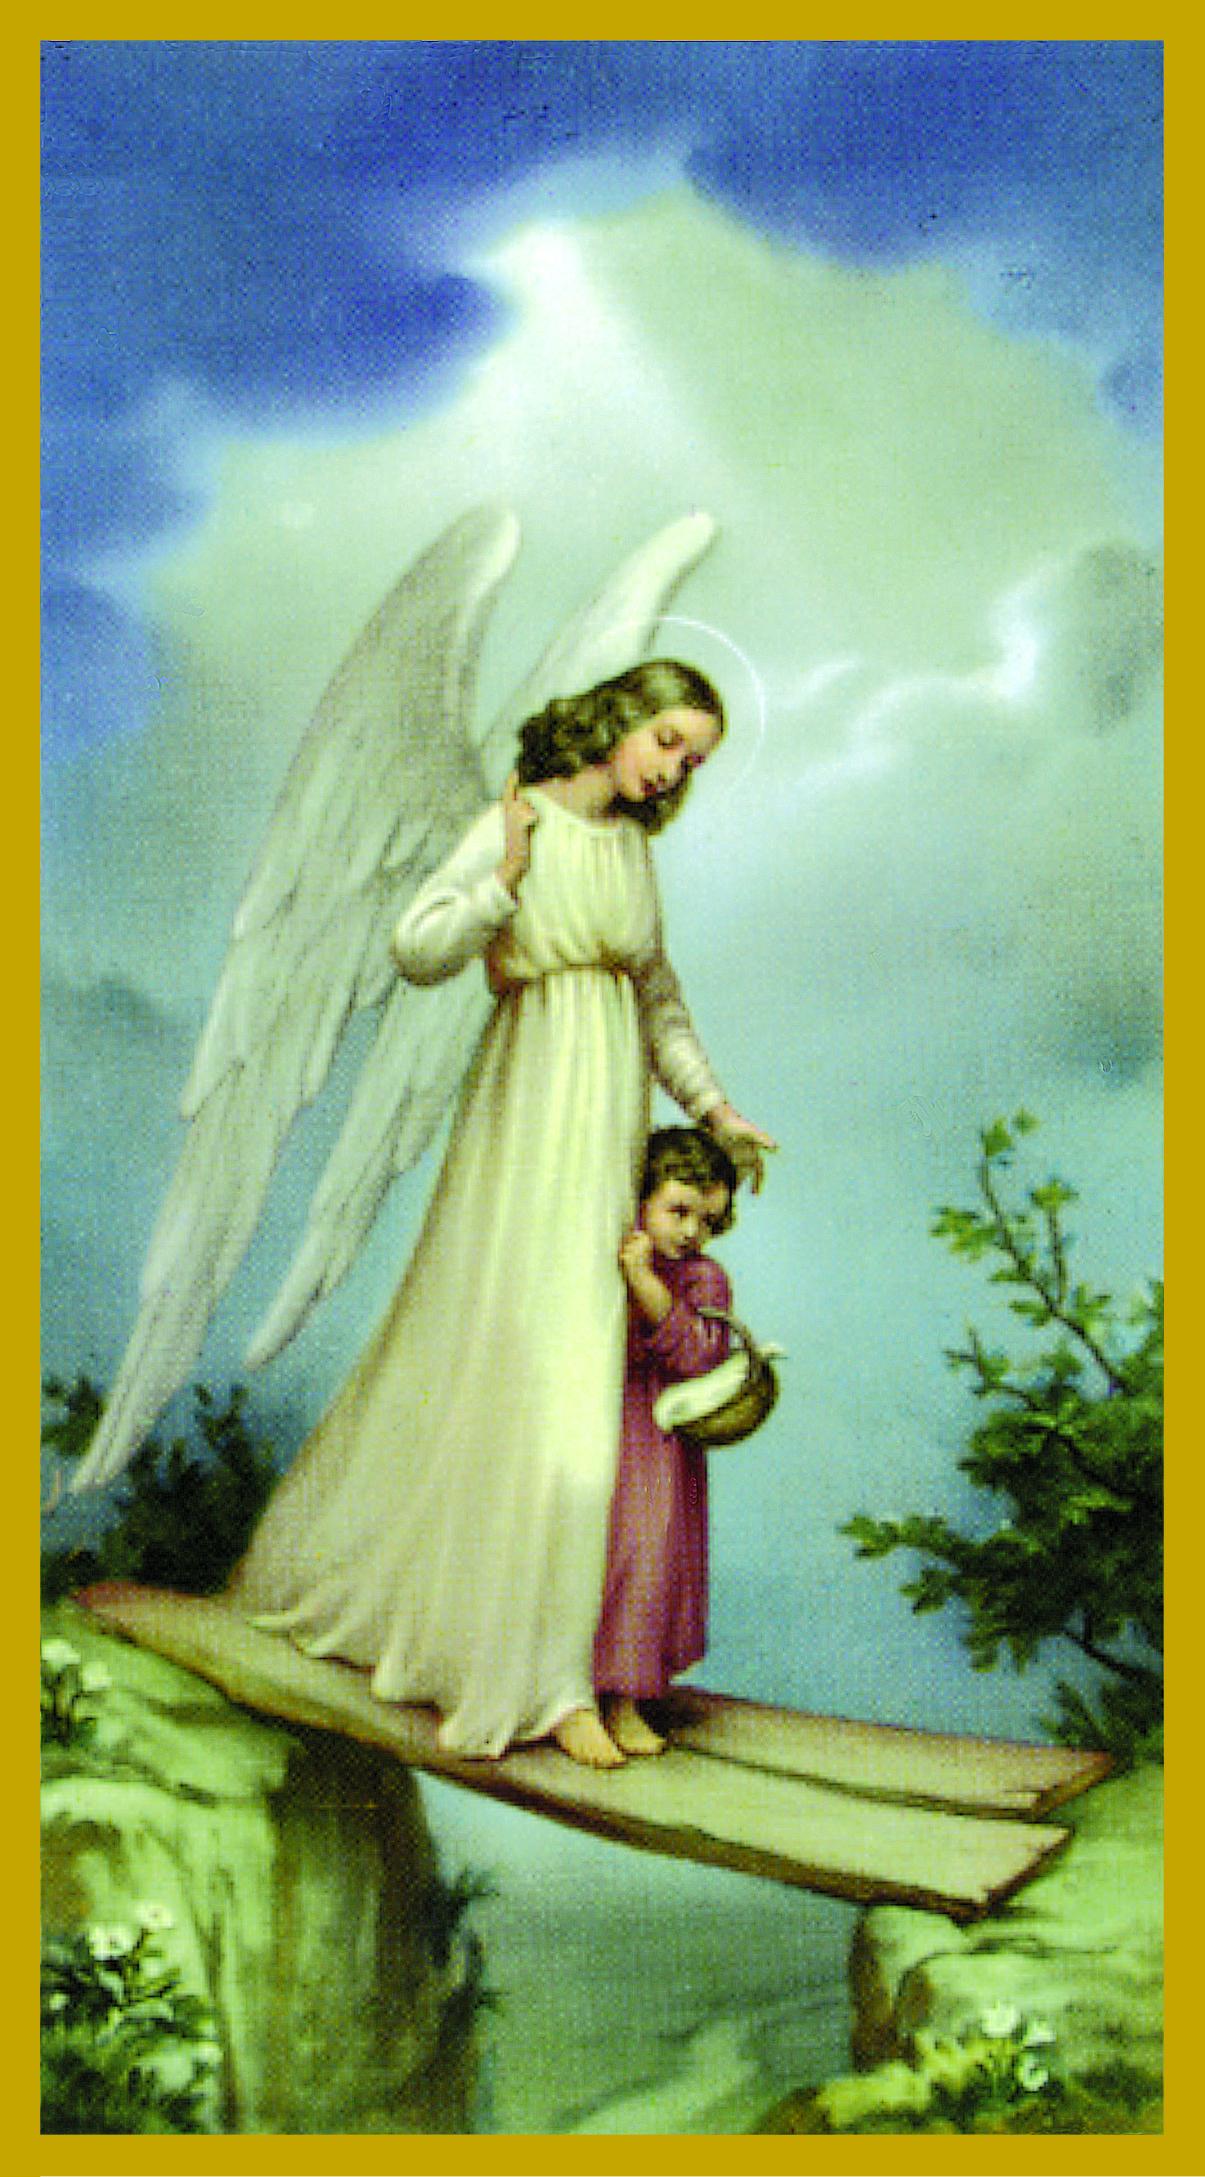 GR-ANG - GUARDIAN ANGELPrayer to Guardian AngelMorning prayer: